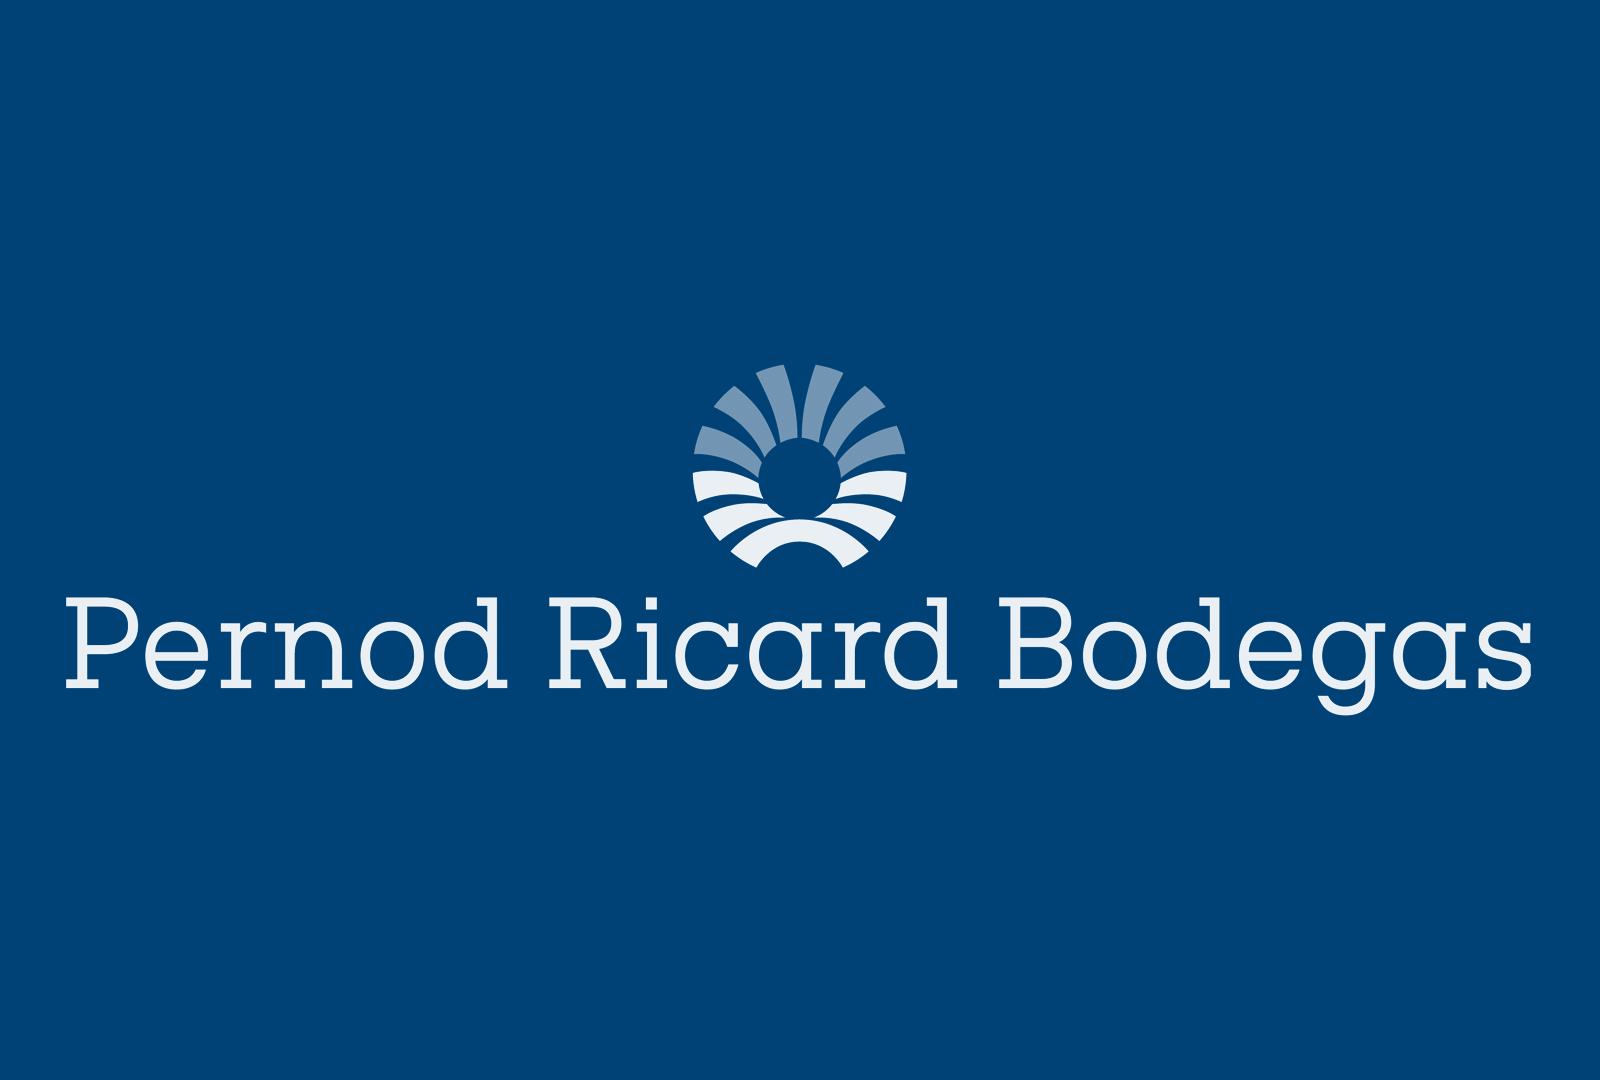 PR Bodegas forma parte del primer test del proyecto PEF.